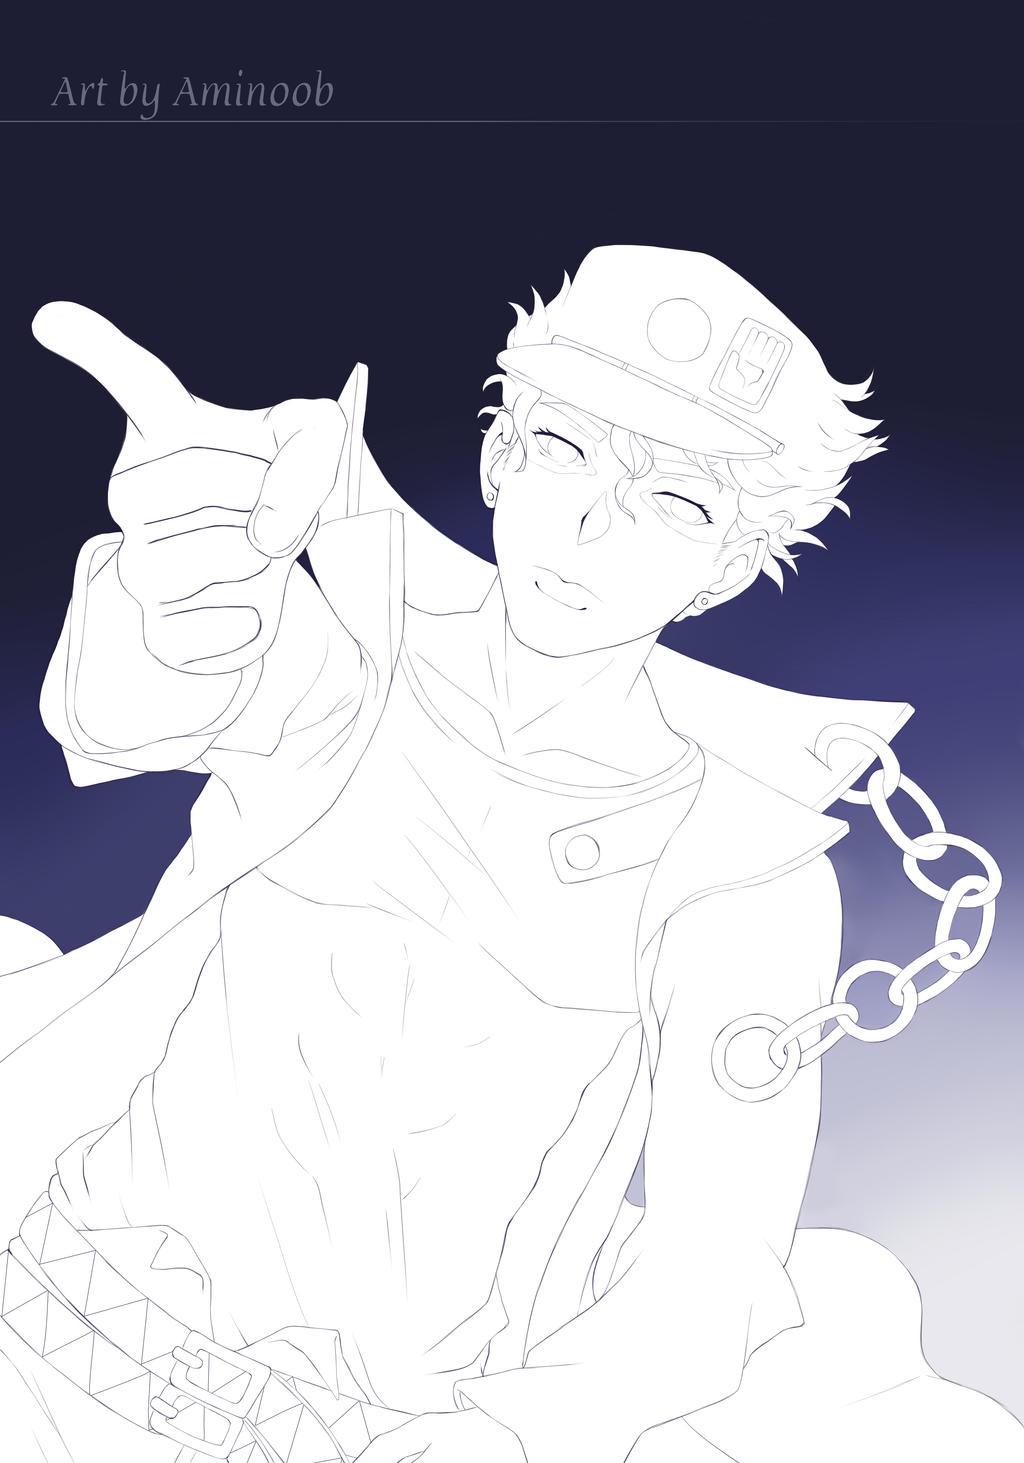 Jotaro - Line art by Aminoob